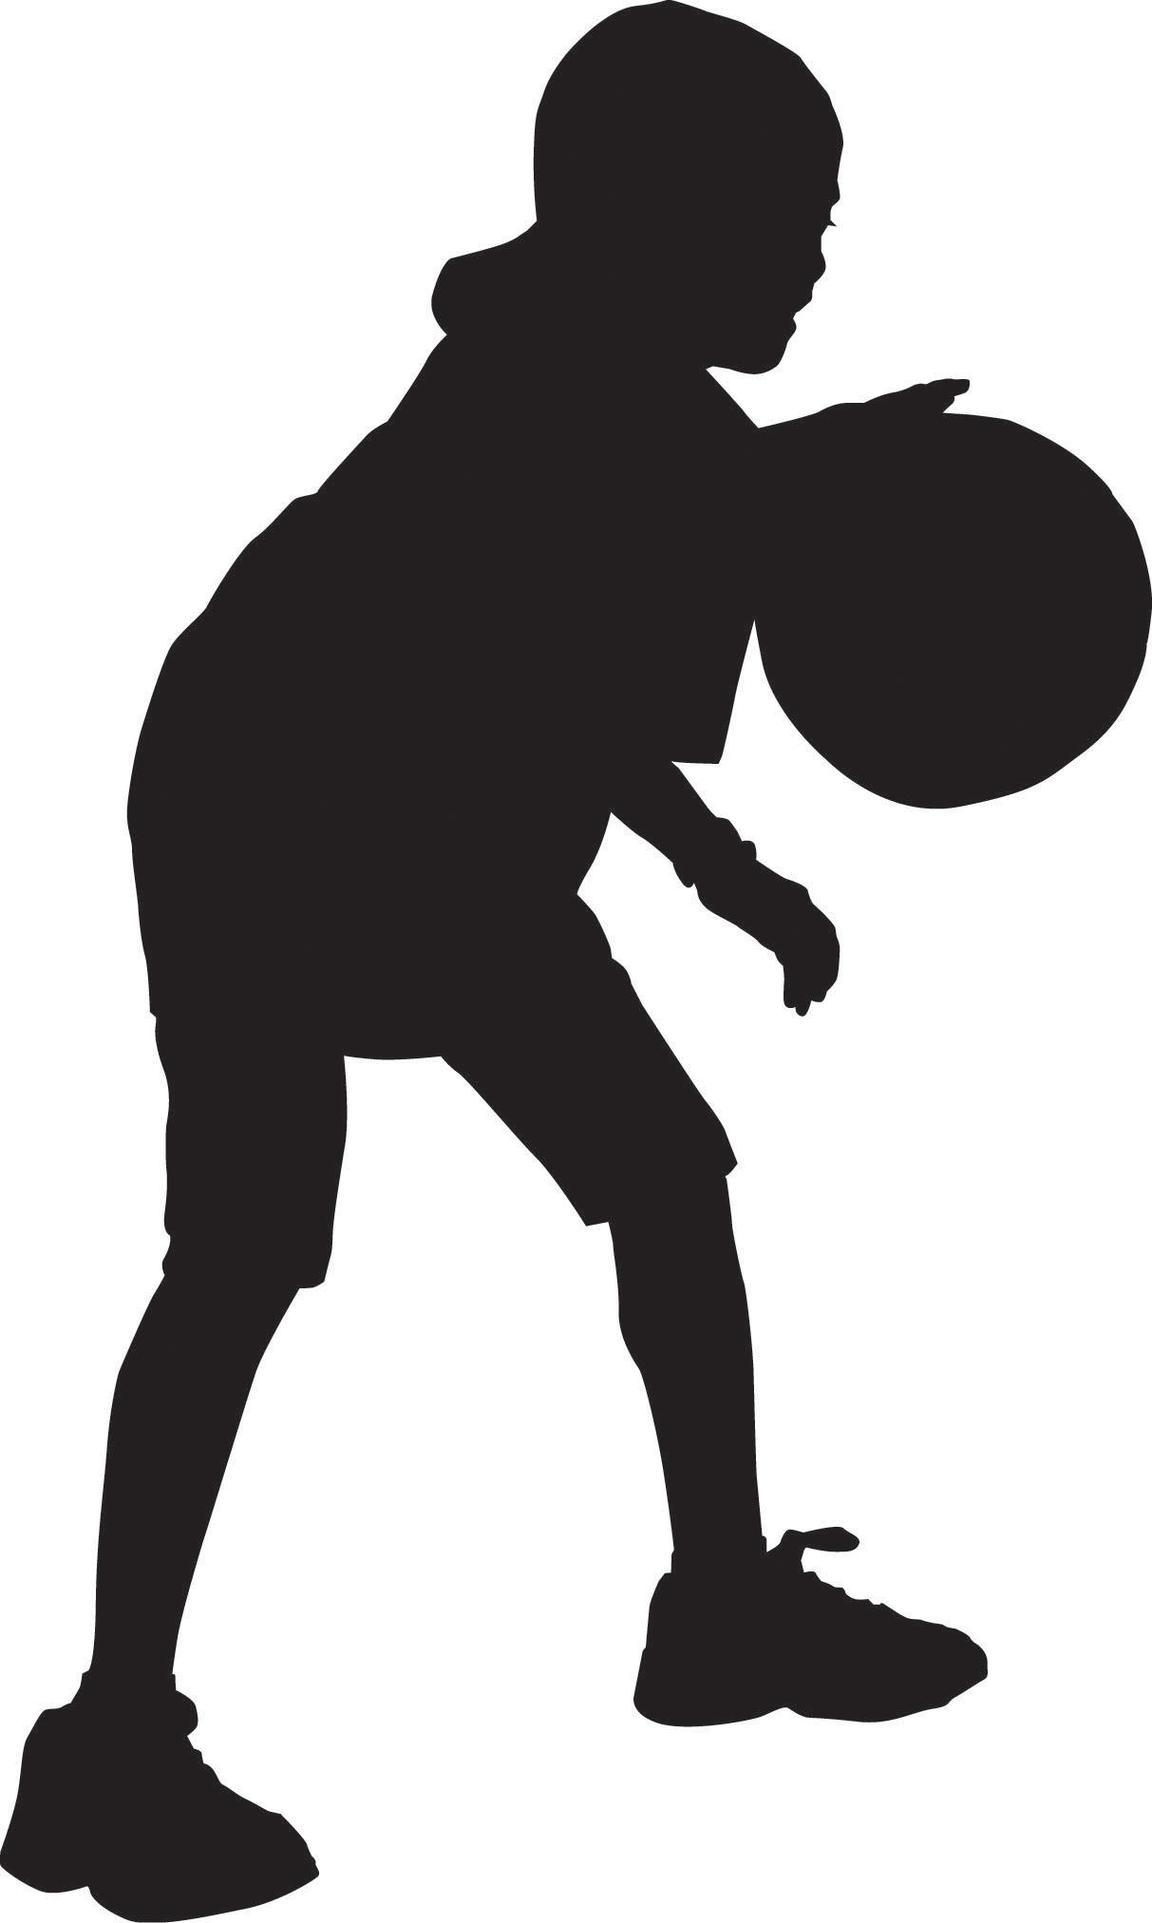 Shaw Jewish Community Center Silhouette Child Playing Basketball.